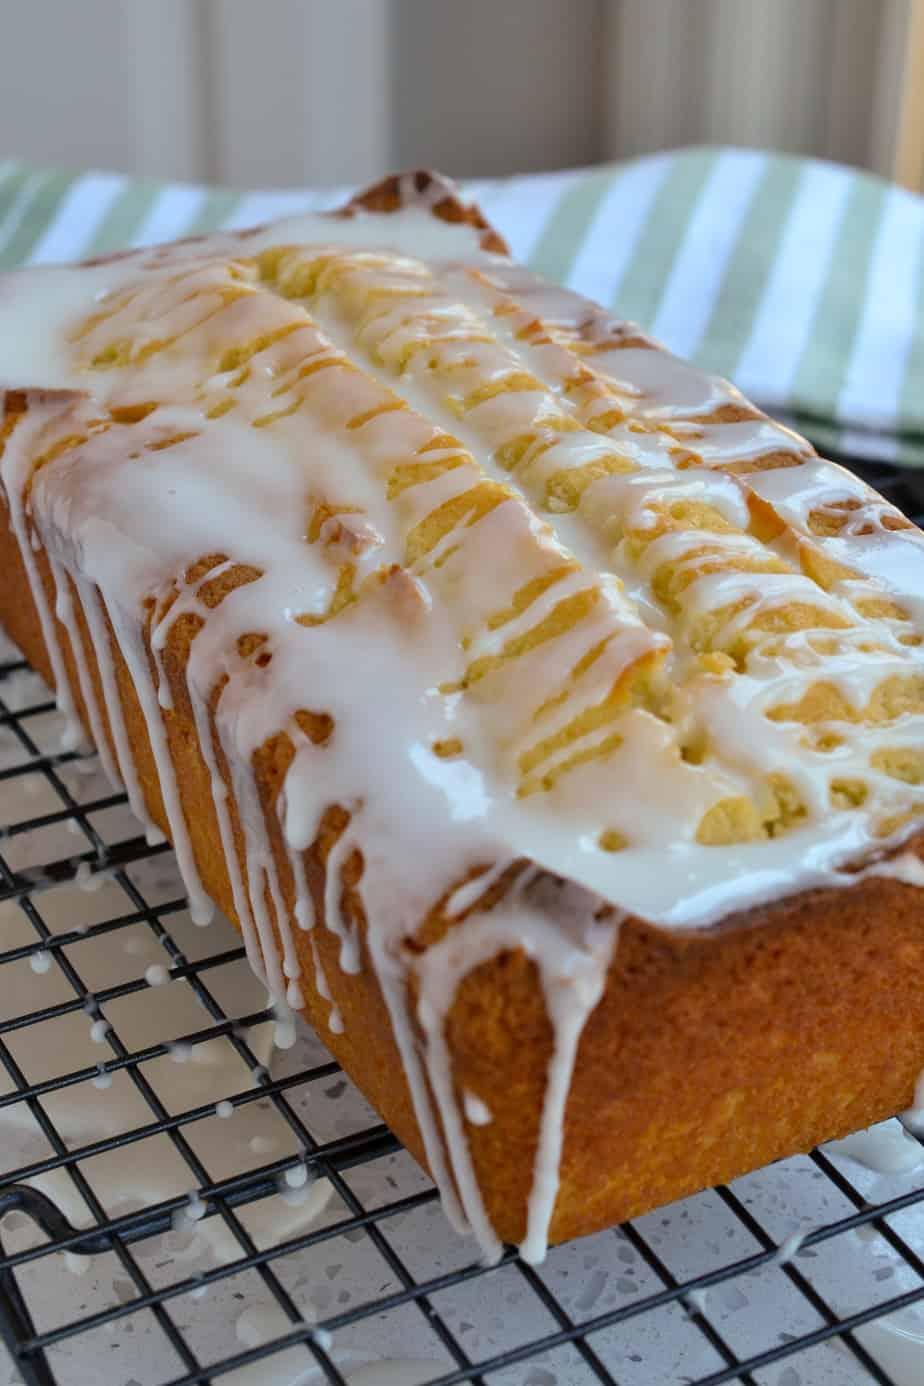 A whole loaf of glazed lemon pound cake